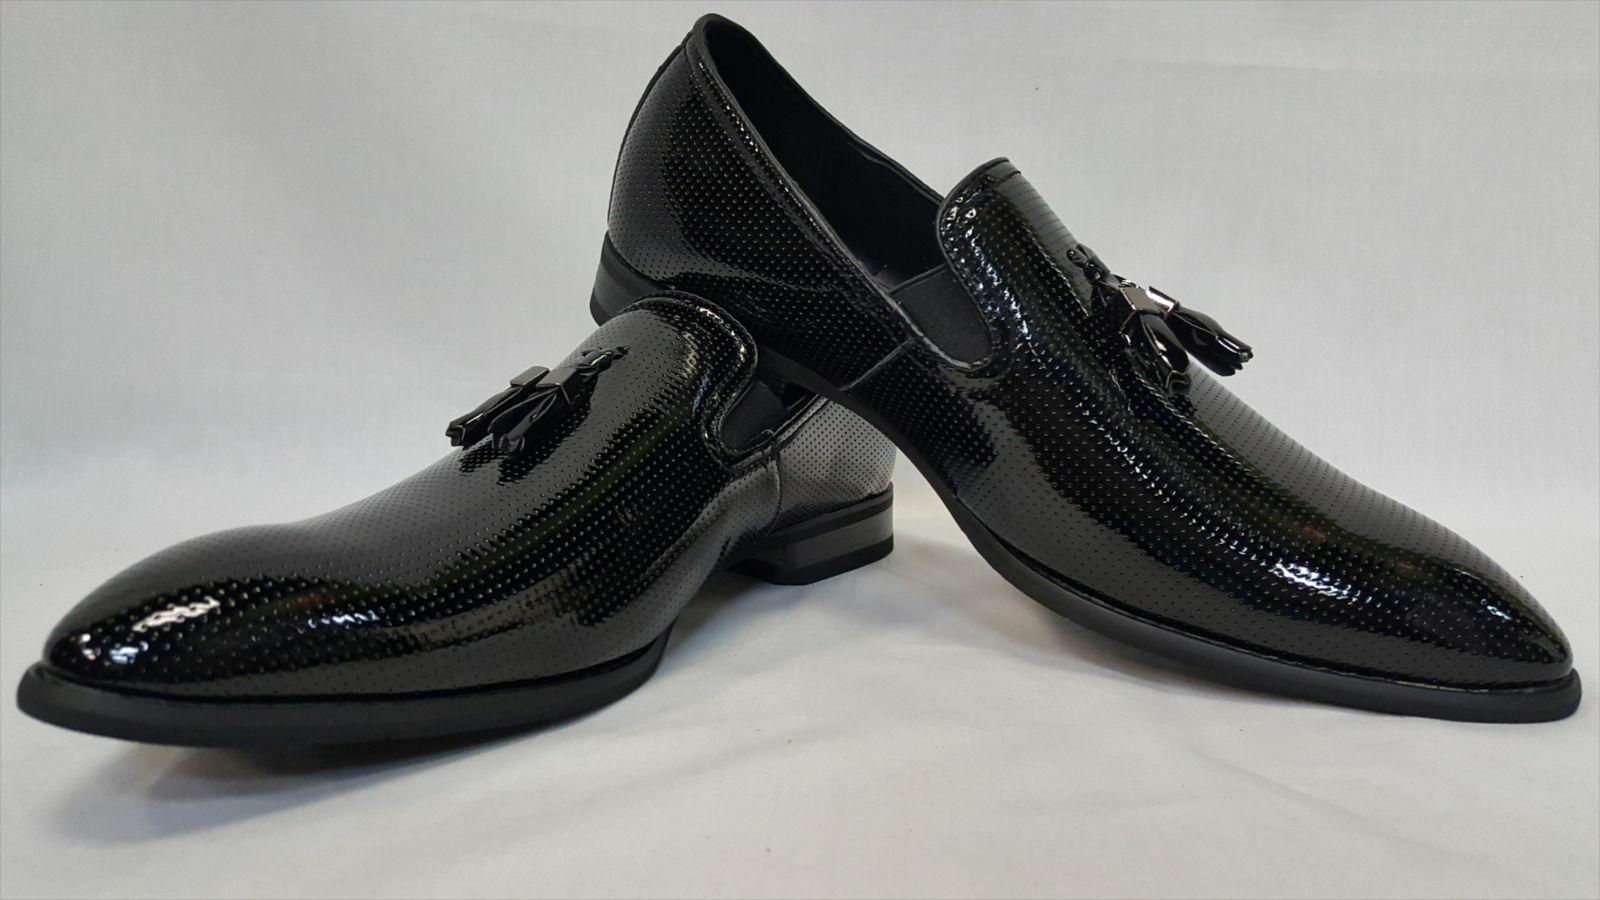 connotazione di lusso low-key NEW Uomo nero Loafers Tassel Wedding Groom scarpe Suit Suit Suit Slip On Casual All Dimensione  molte sorprese